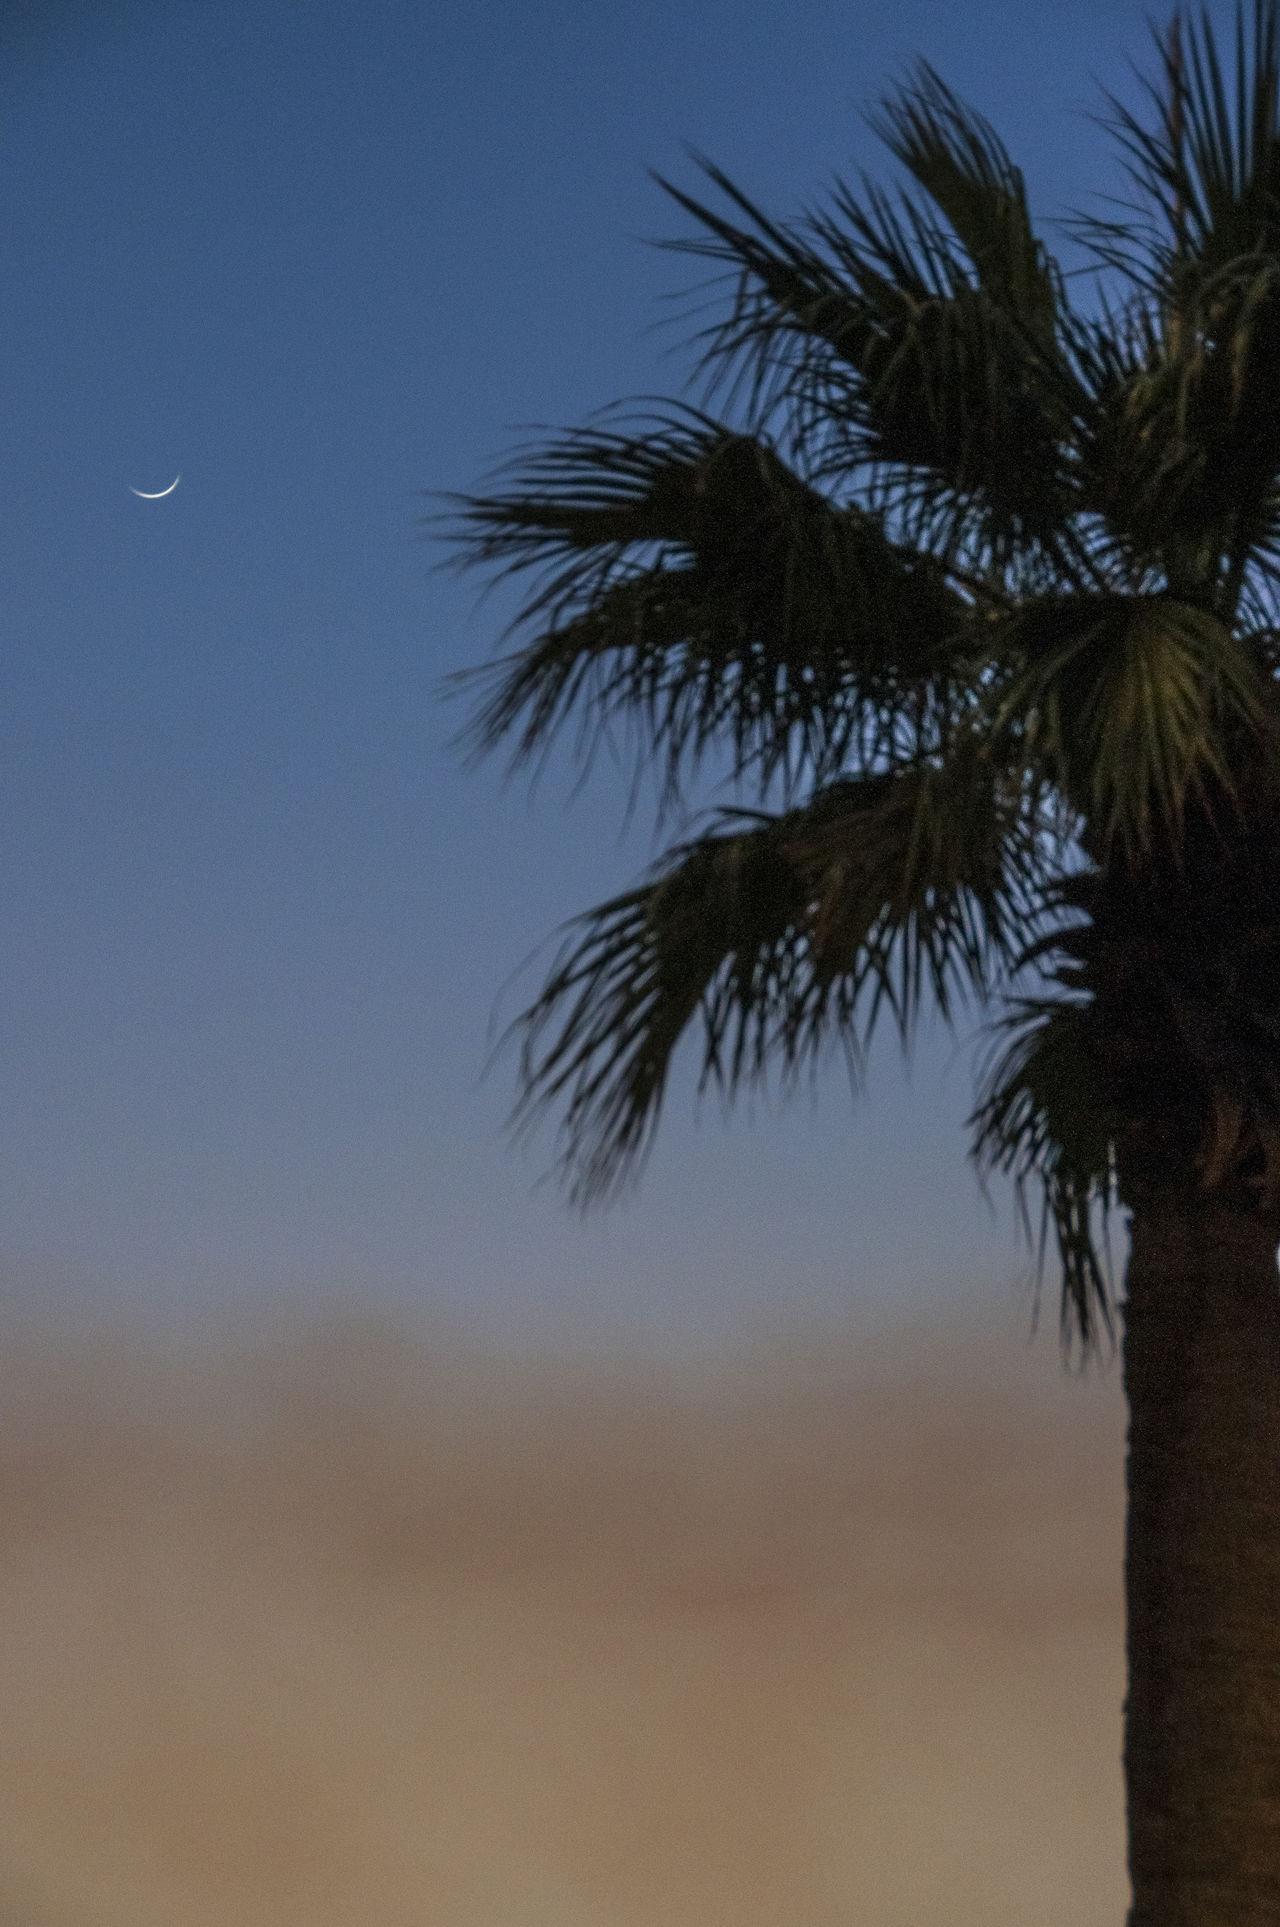 Beauty In Nature Dusk Dusk Sky Kuwait Palm Tree Palm Tree Sandstorm Scenics Sunset Sunset Collection Tranquil Scene